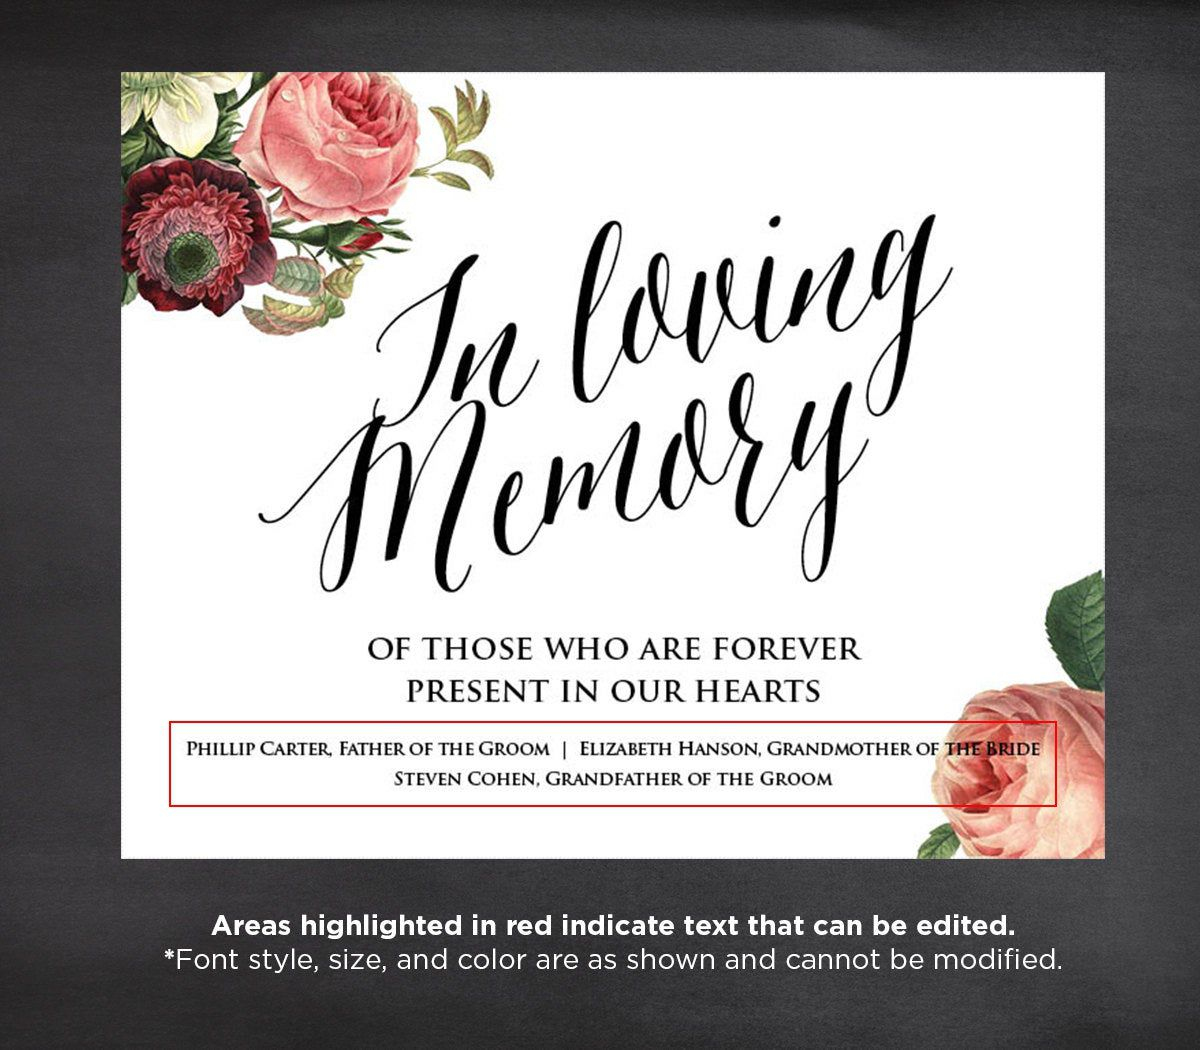 005 Unbelievable In Loving Memory Template Design  Templates WordFull